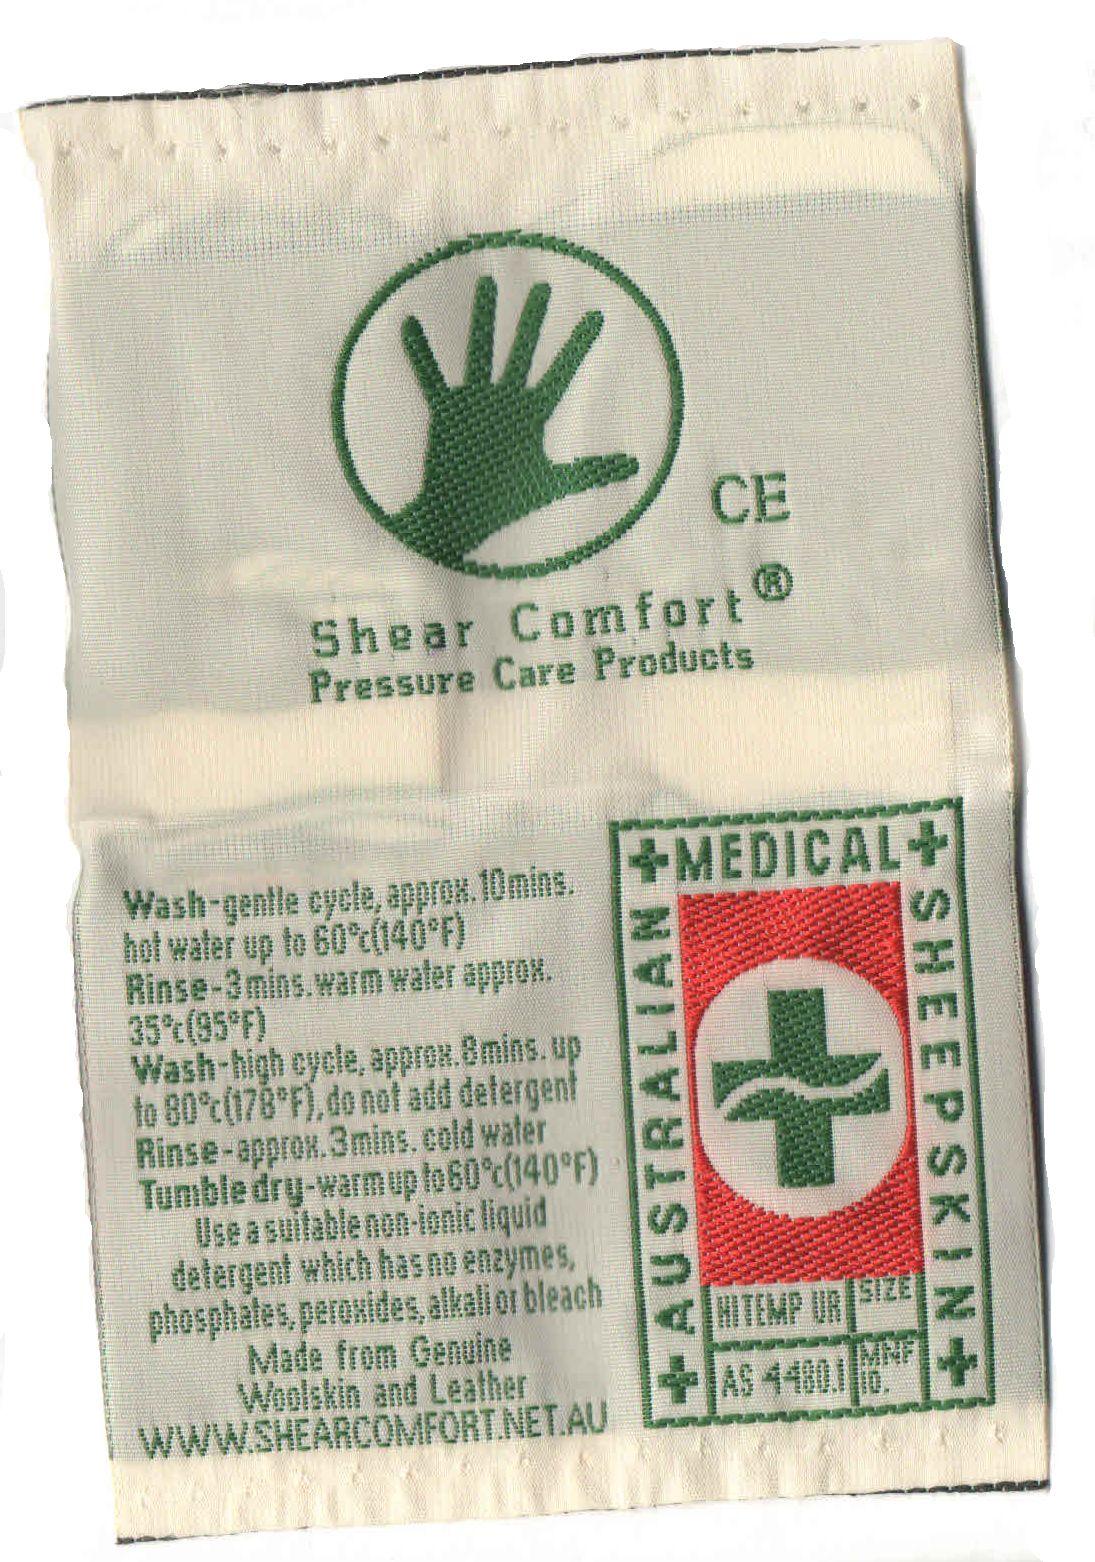 shearcomfort-tag-greenedited.jpg